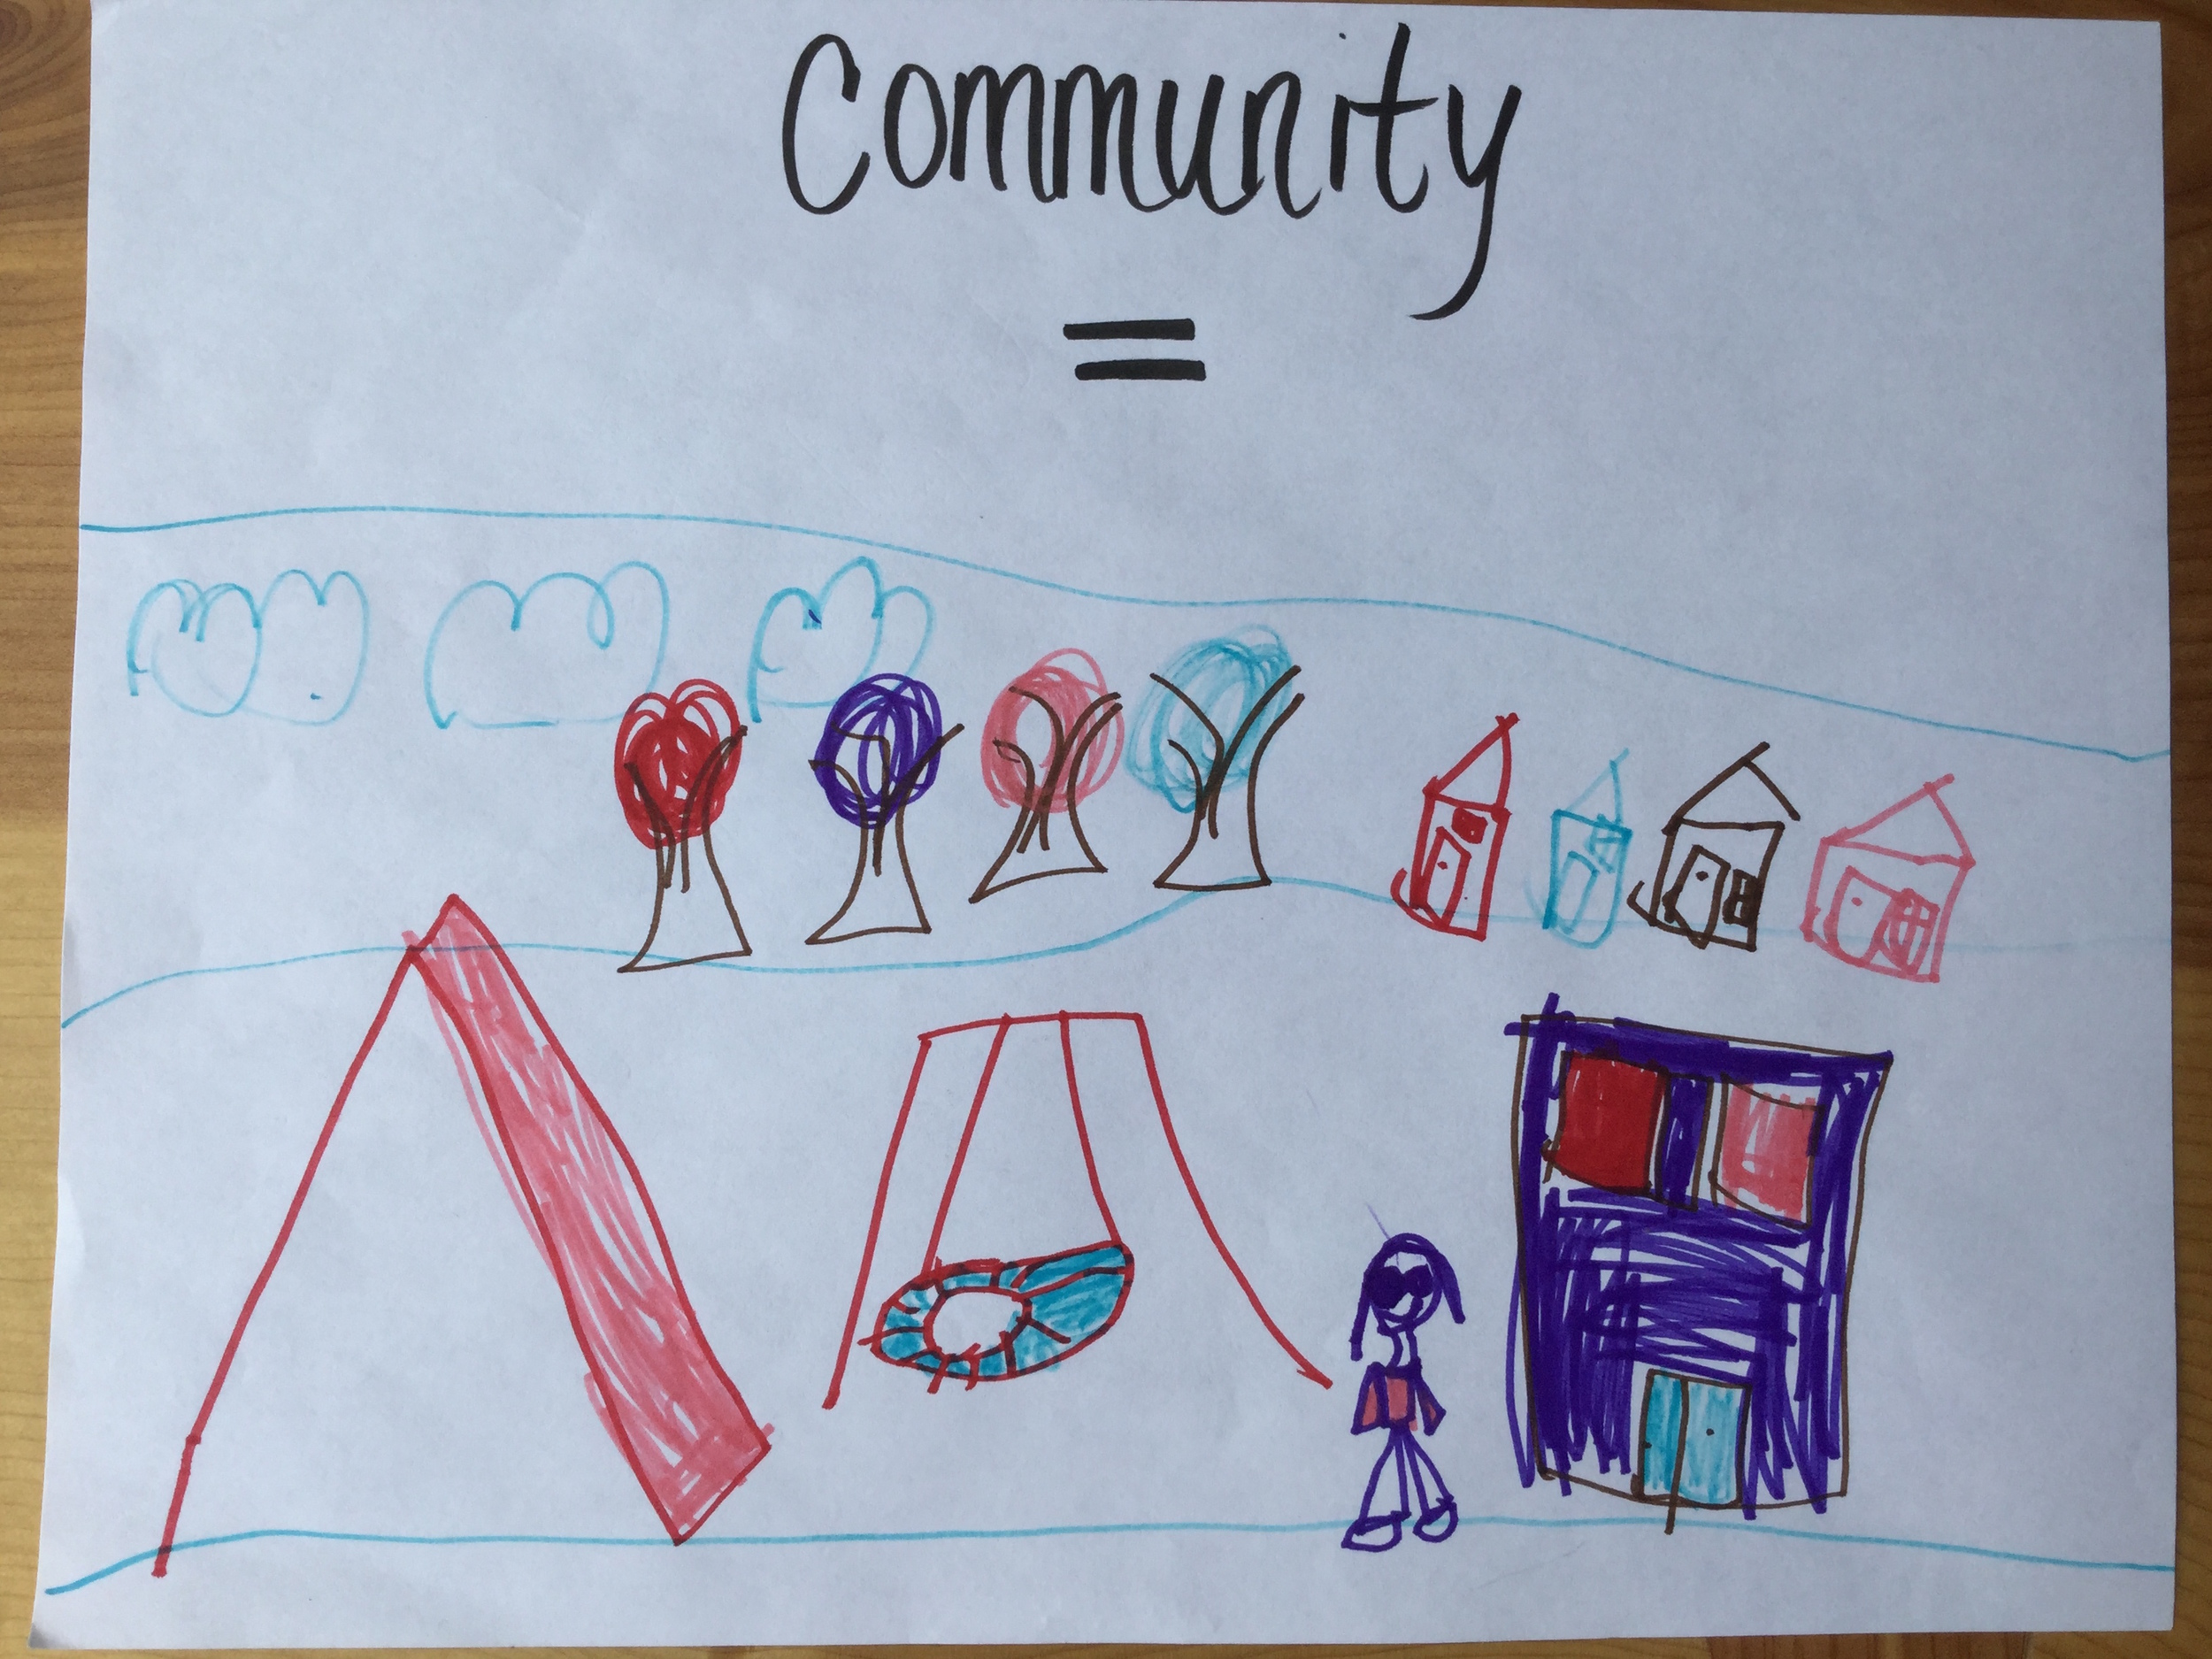 APANO - QunBei's child drawing community.JPG